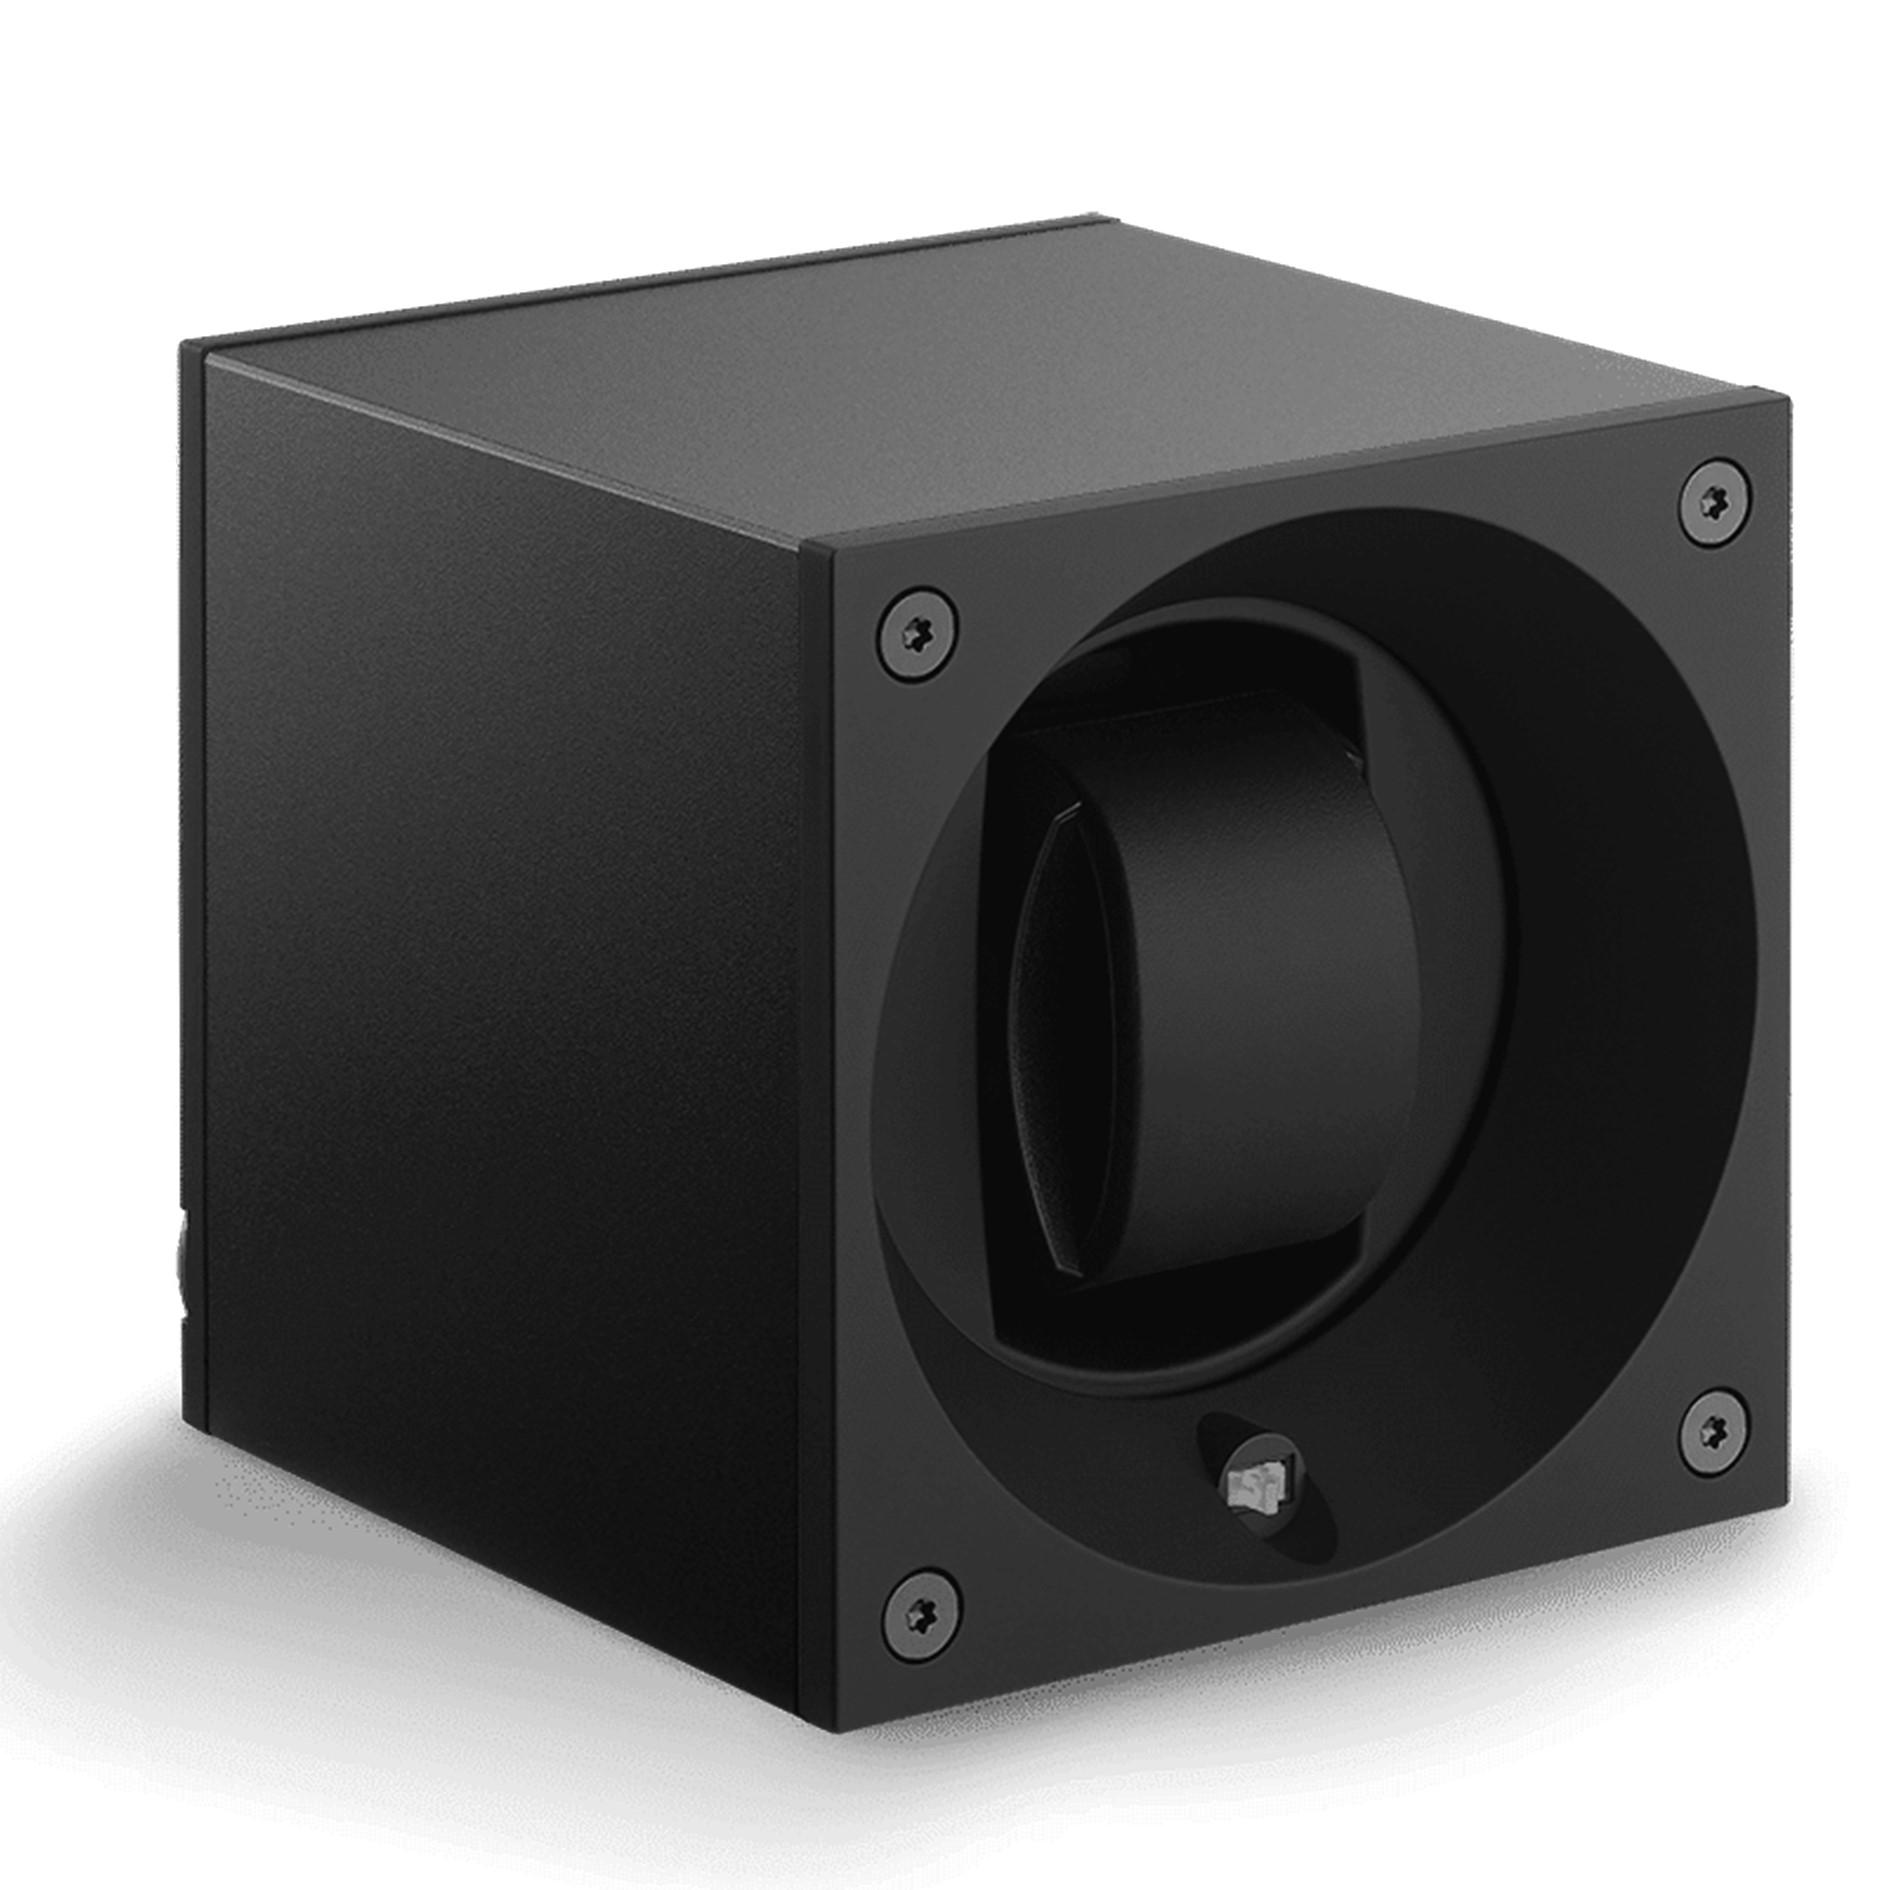 Caja de movimiento para 1 reloj - Masterbox Negra>